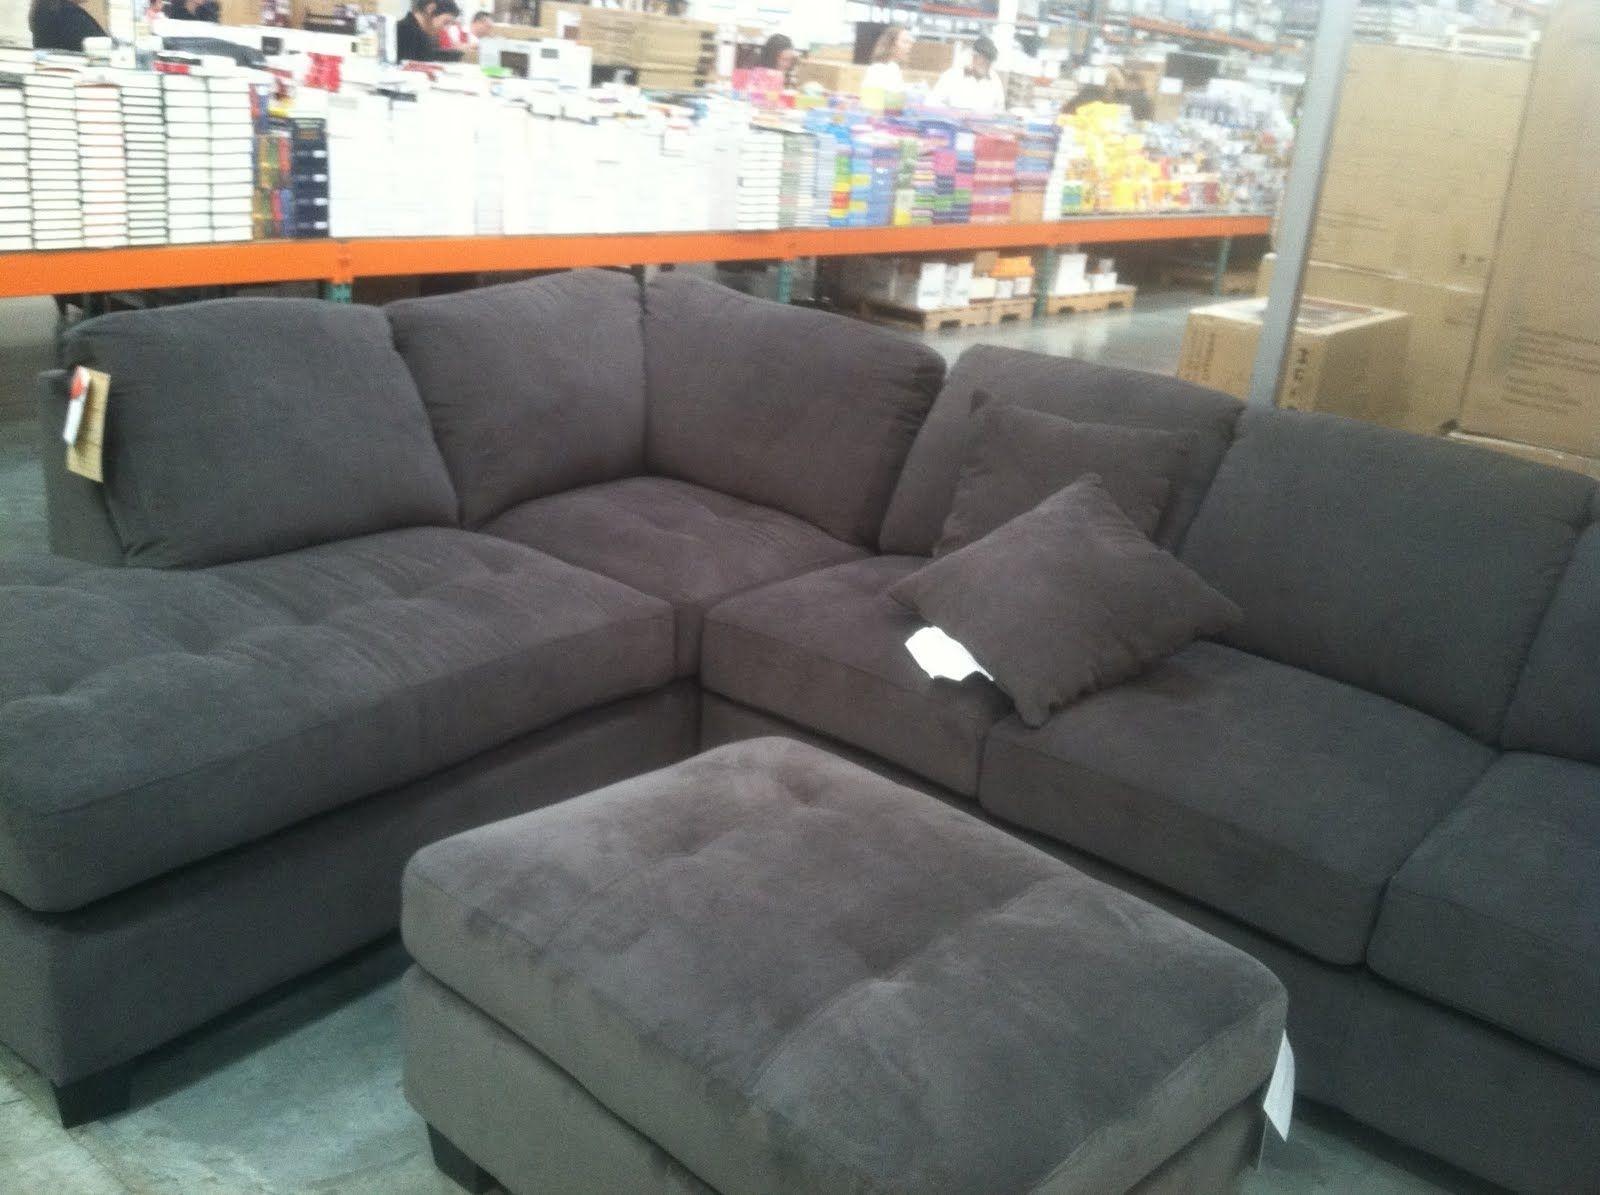 Cool Modular Sectional Sofa Costco , Inspirational Modular Sectional Regarding Sectional Sofas At Costco (View 4 of 10)